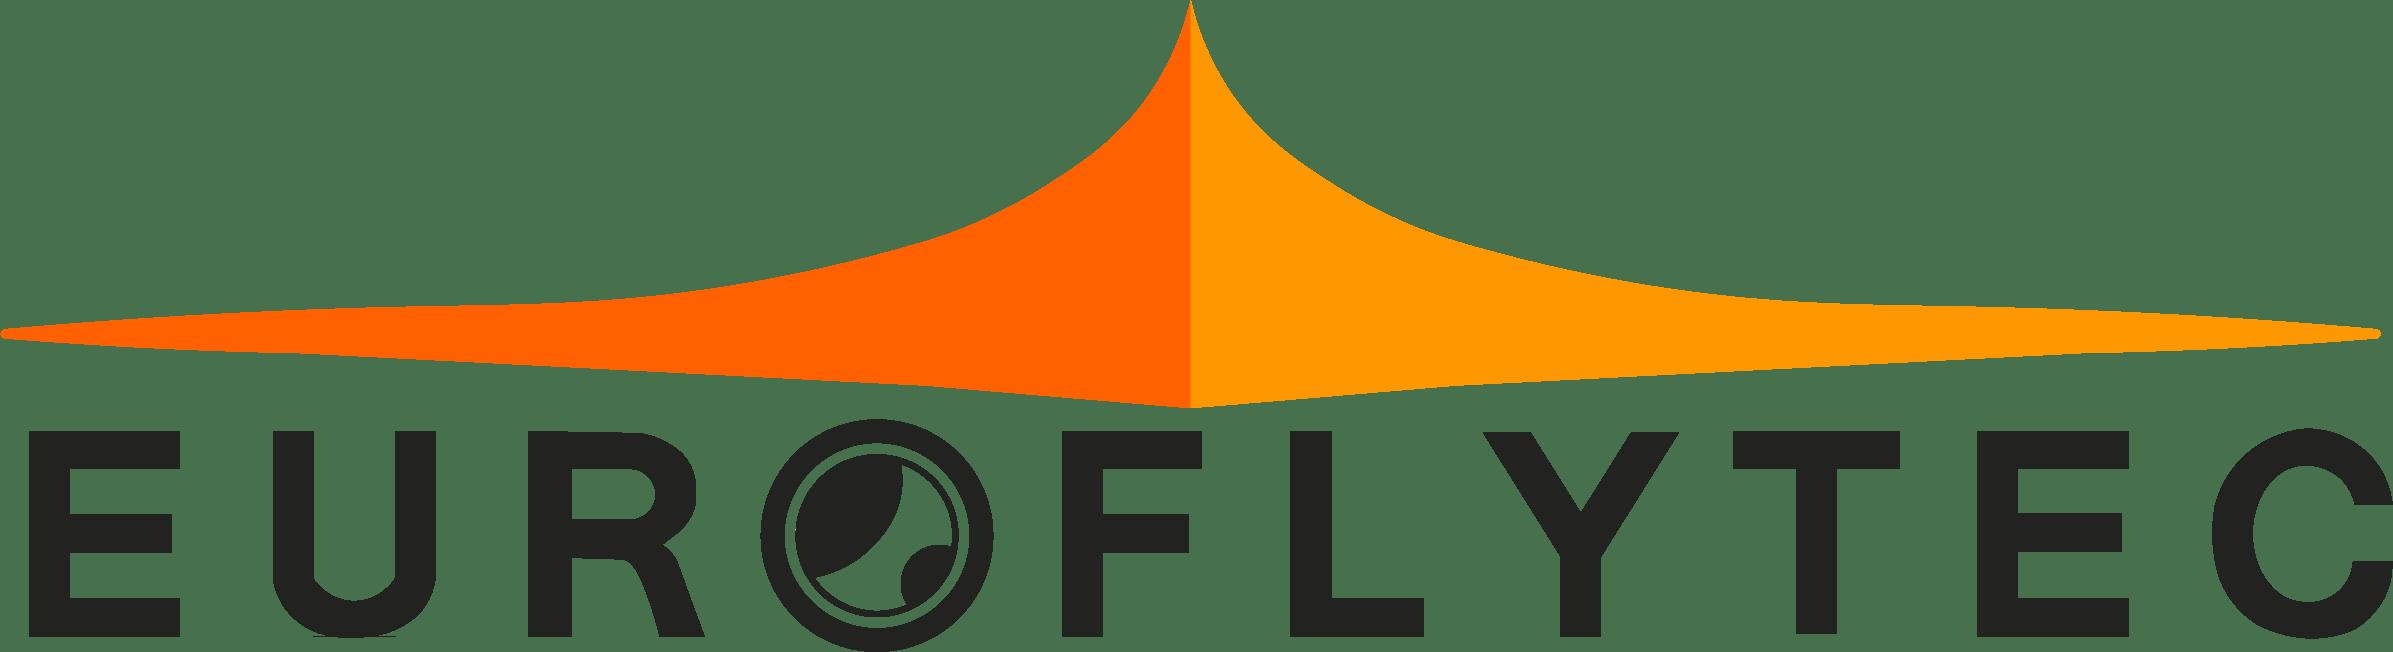 Euroflytec Drones